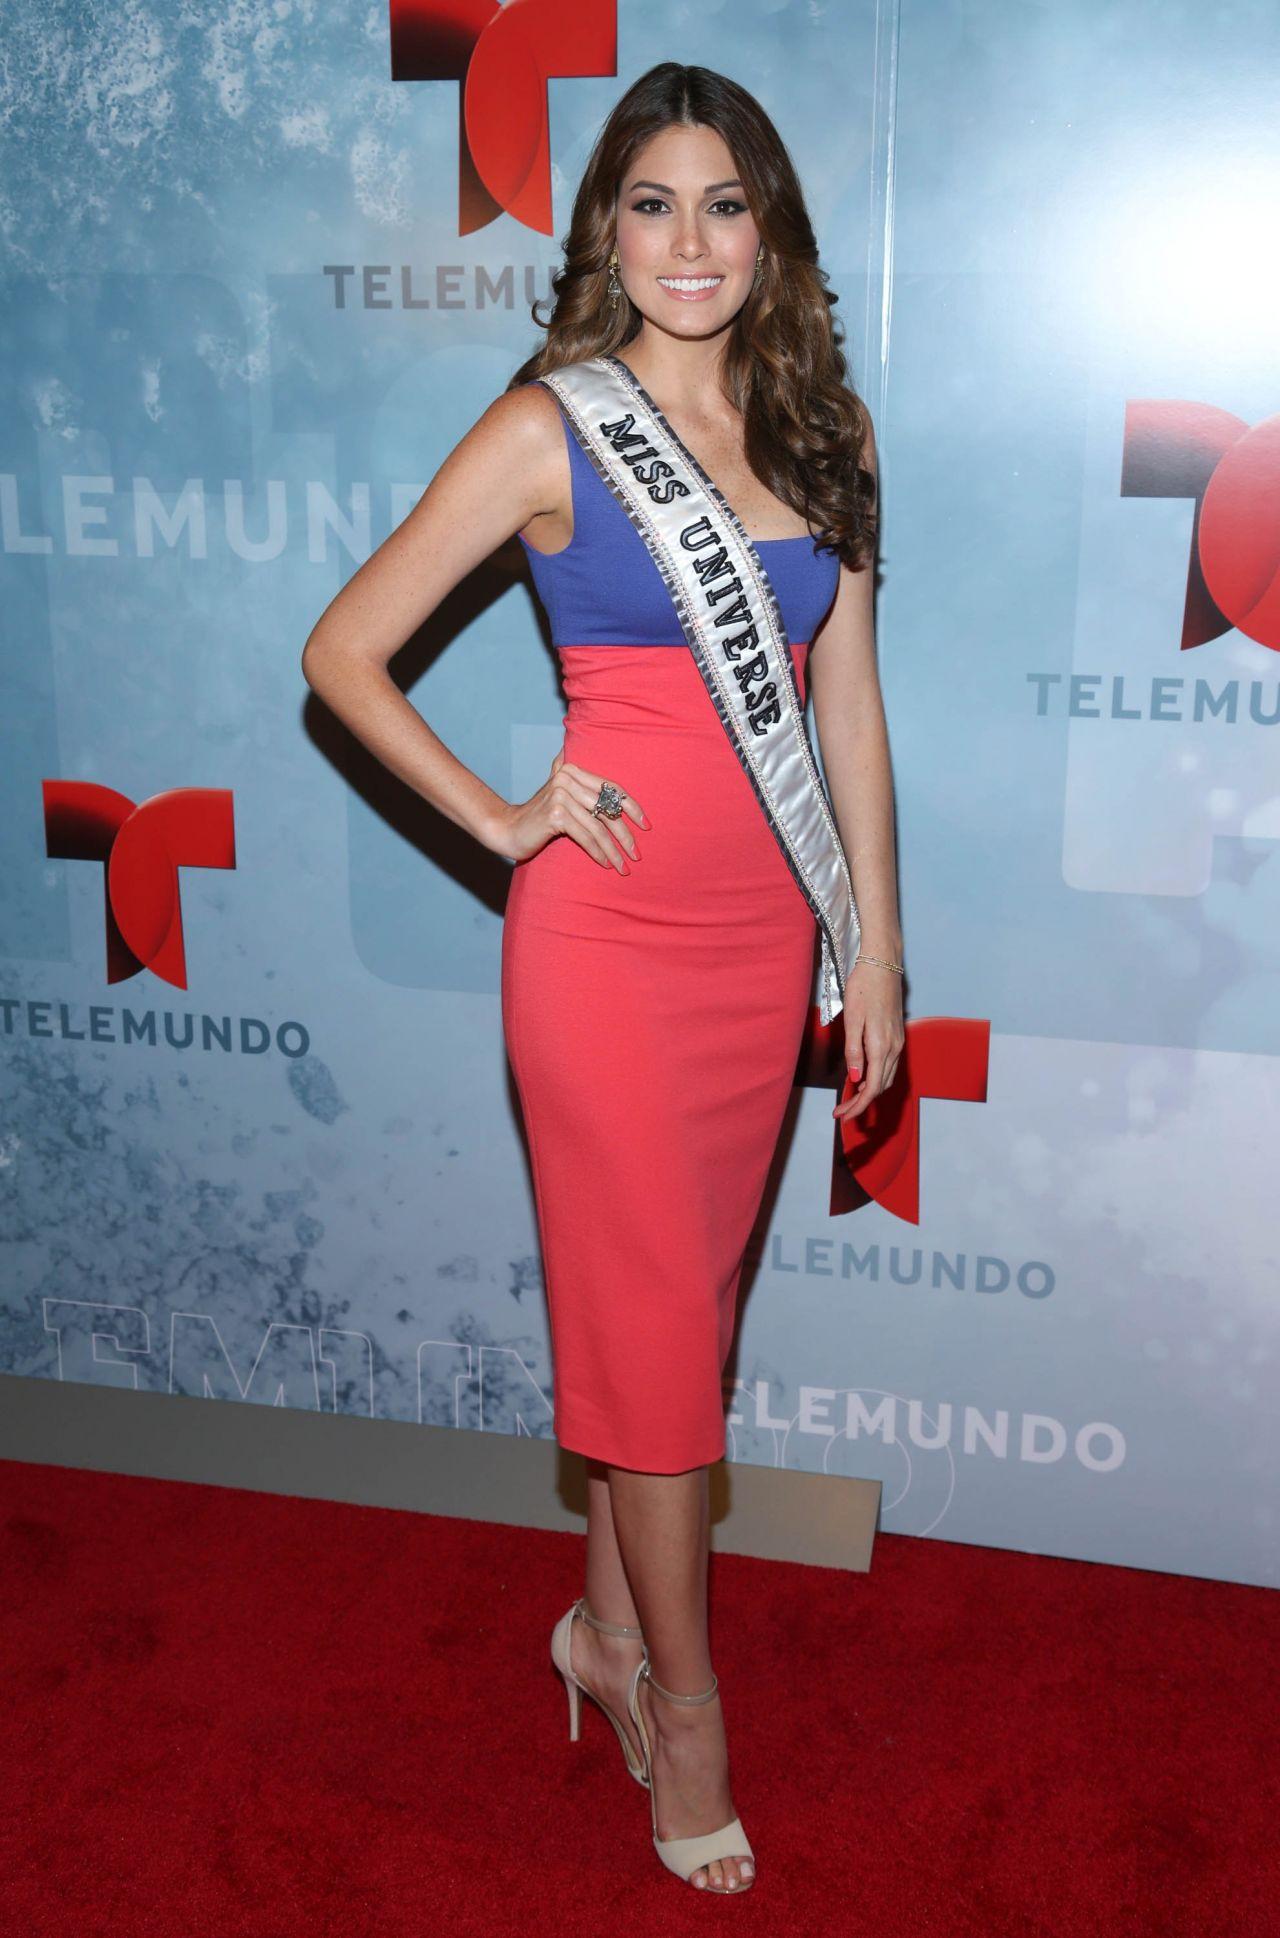 Gabriela Isler - 2014 Telemundo Upfront